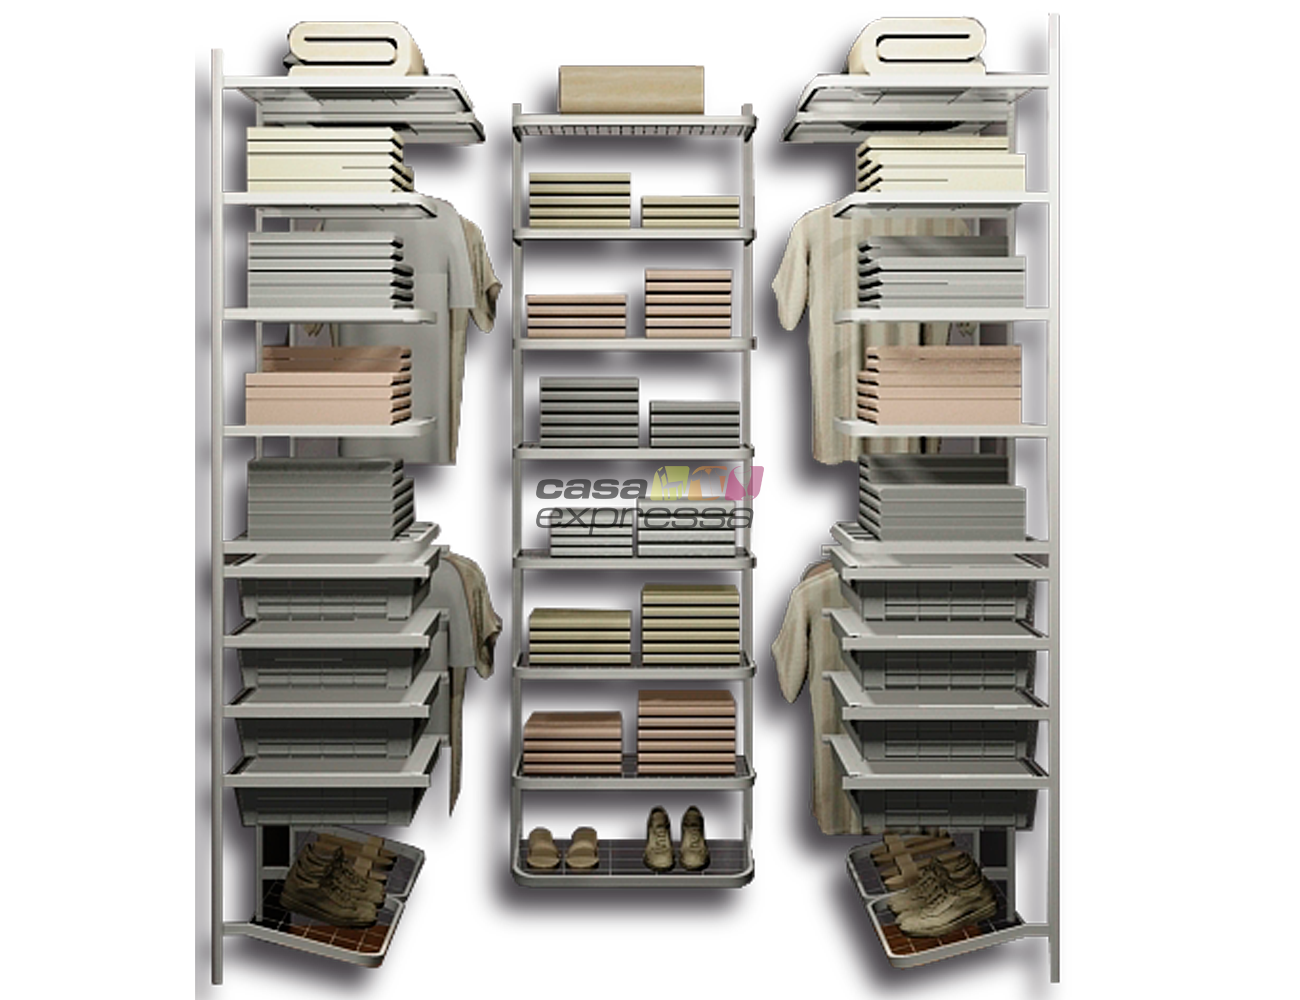 Closet Aramado em U CLU01 - 1,30m x 1,80m x 1,30m - CASA EXPRESSA